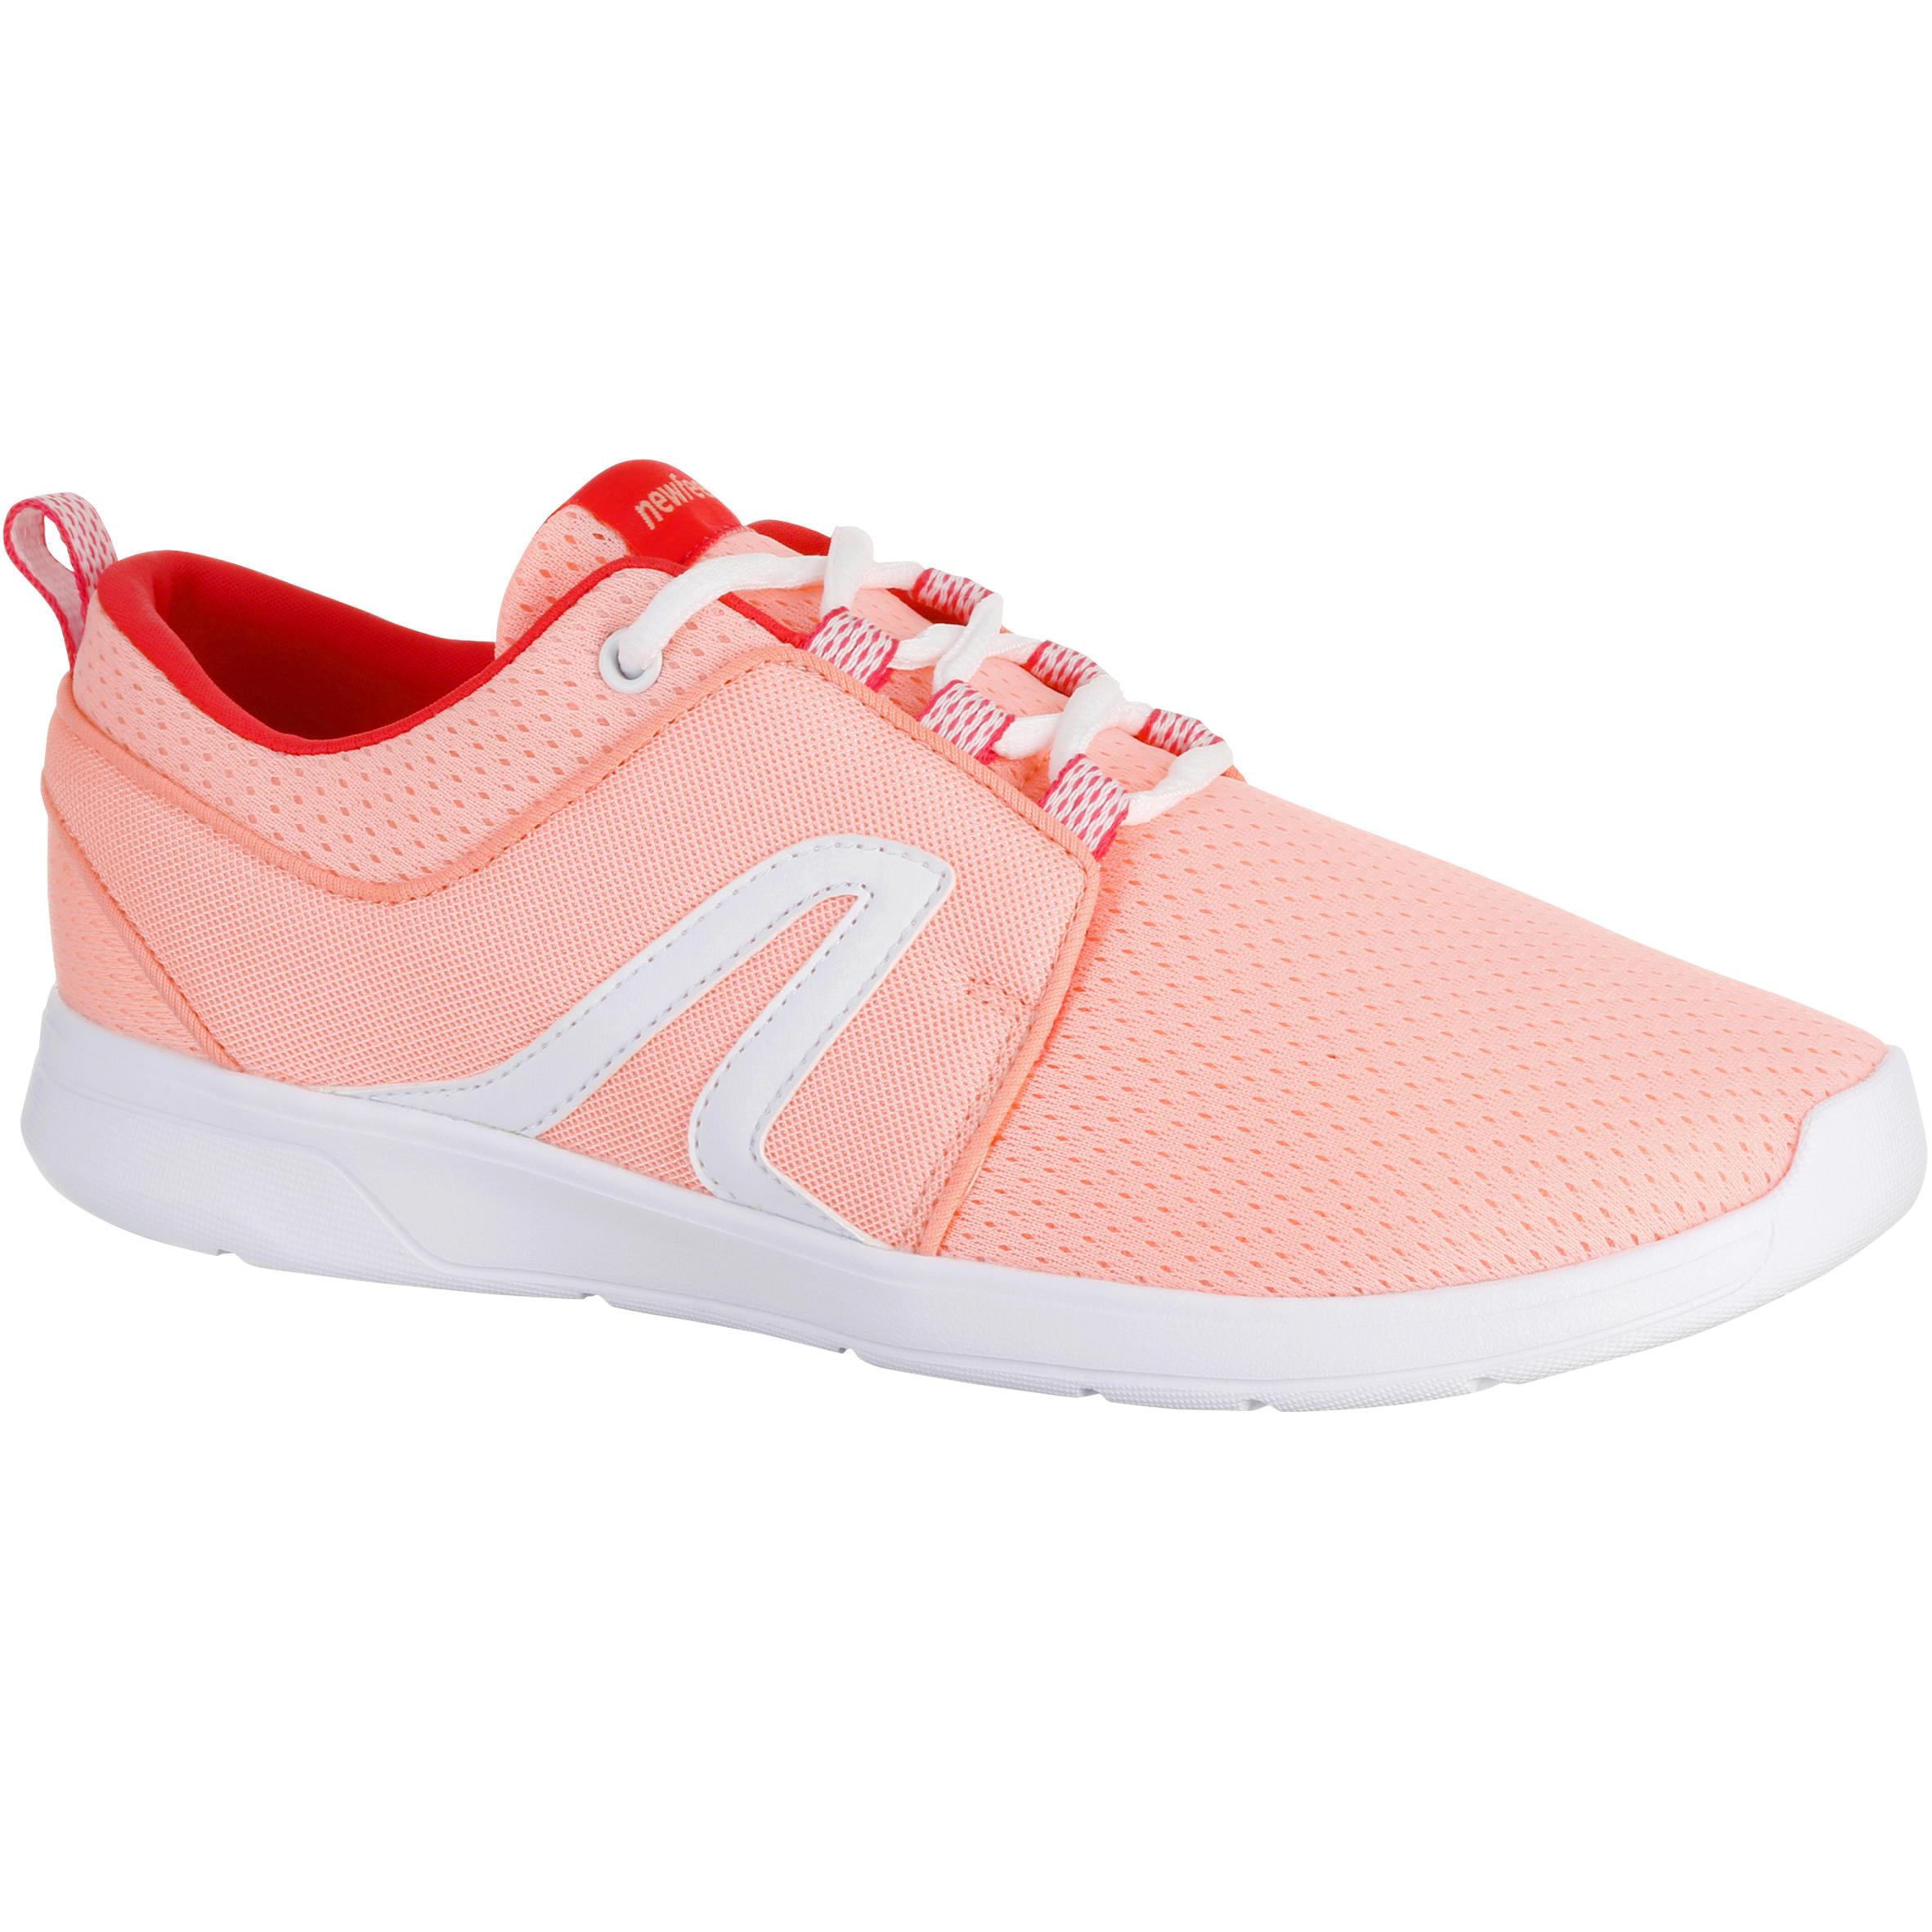 Newfeel Damessneakers Soft 140 Mesh